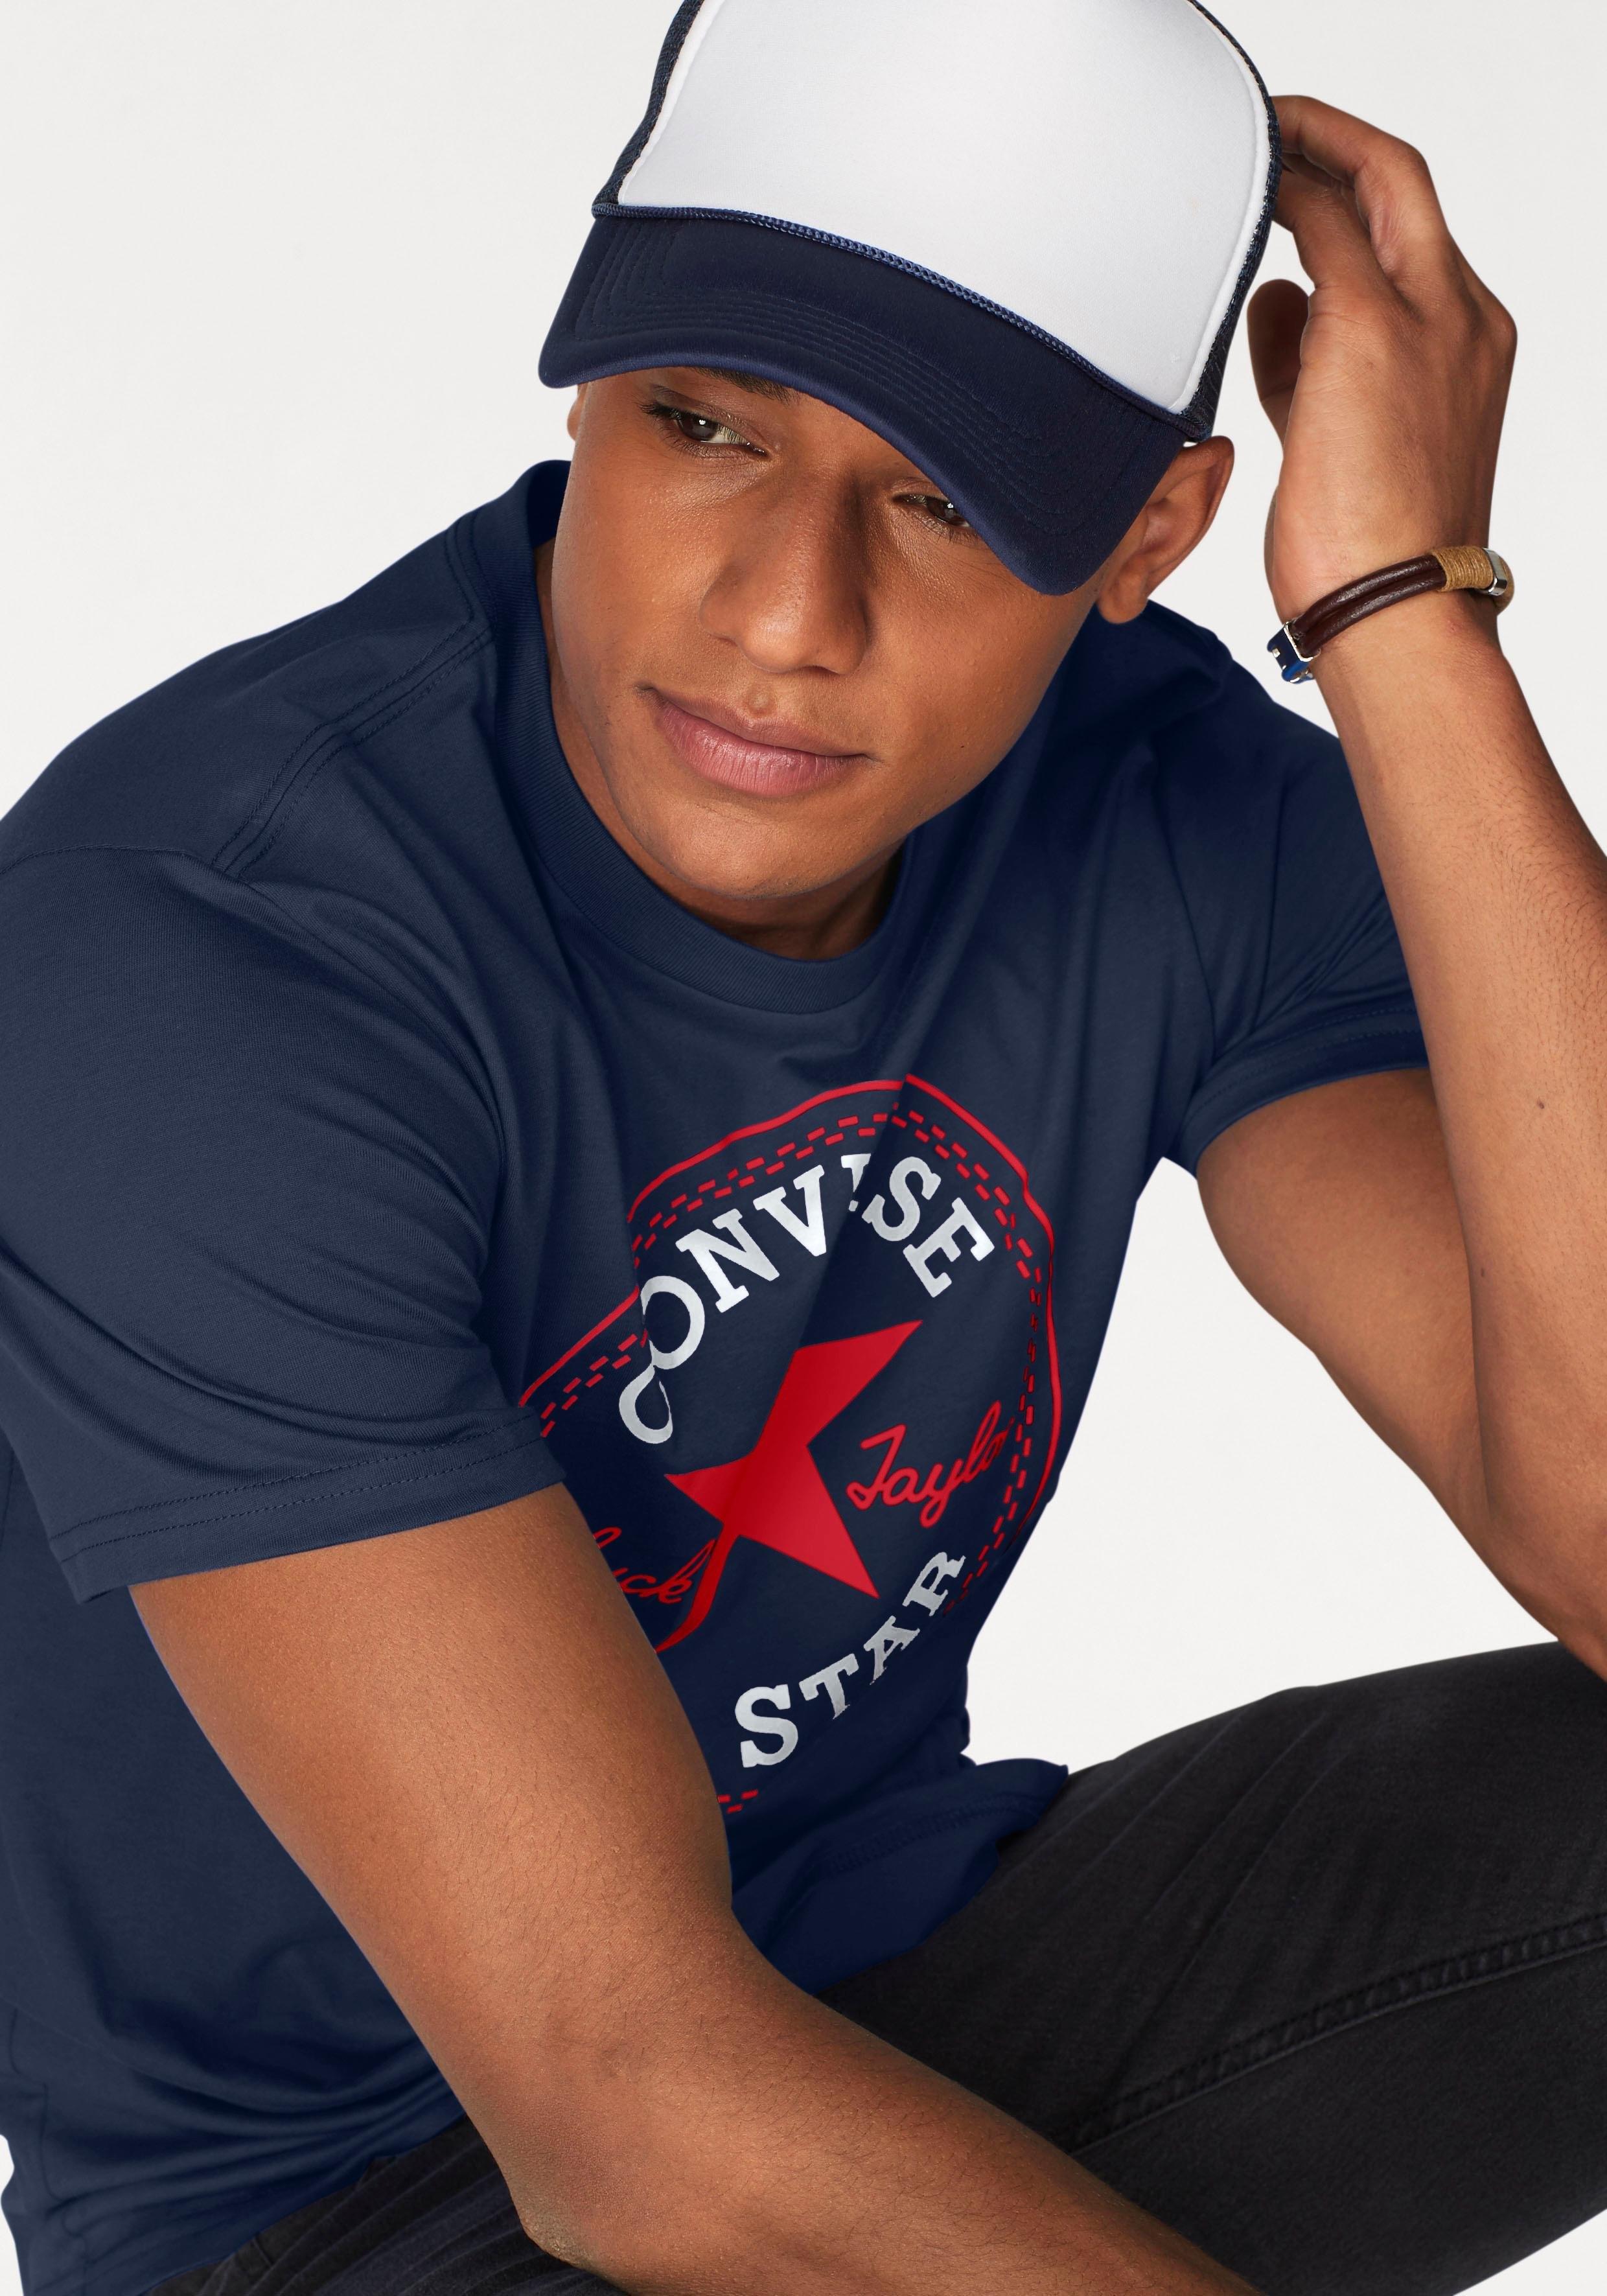 shirtcore Patch De In Chuck Tee Converse T Online Shop n0ymNwv8OP